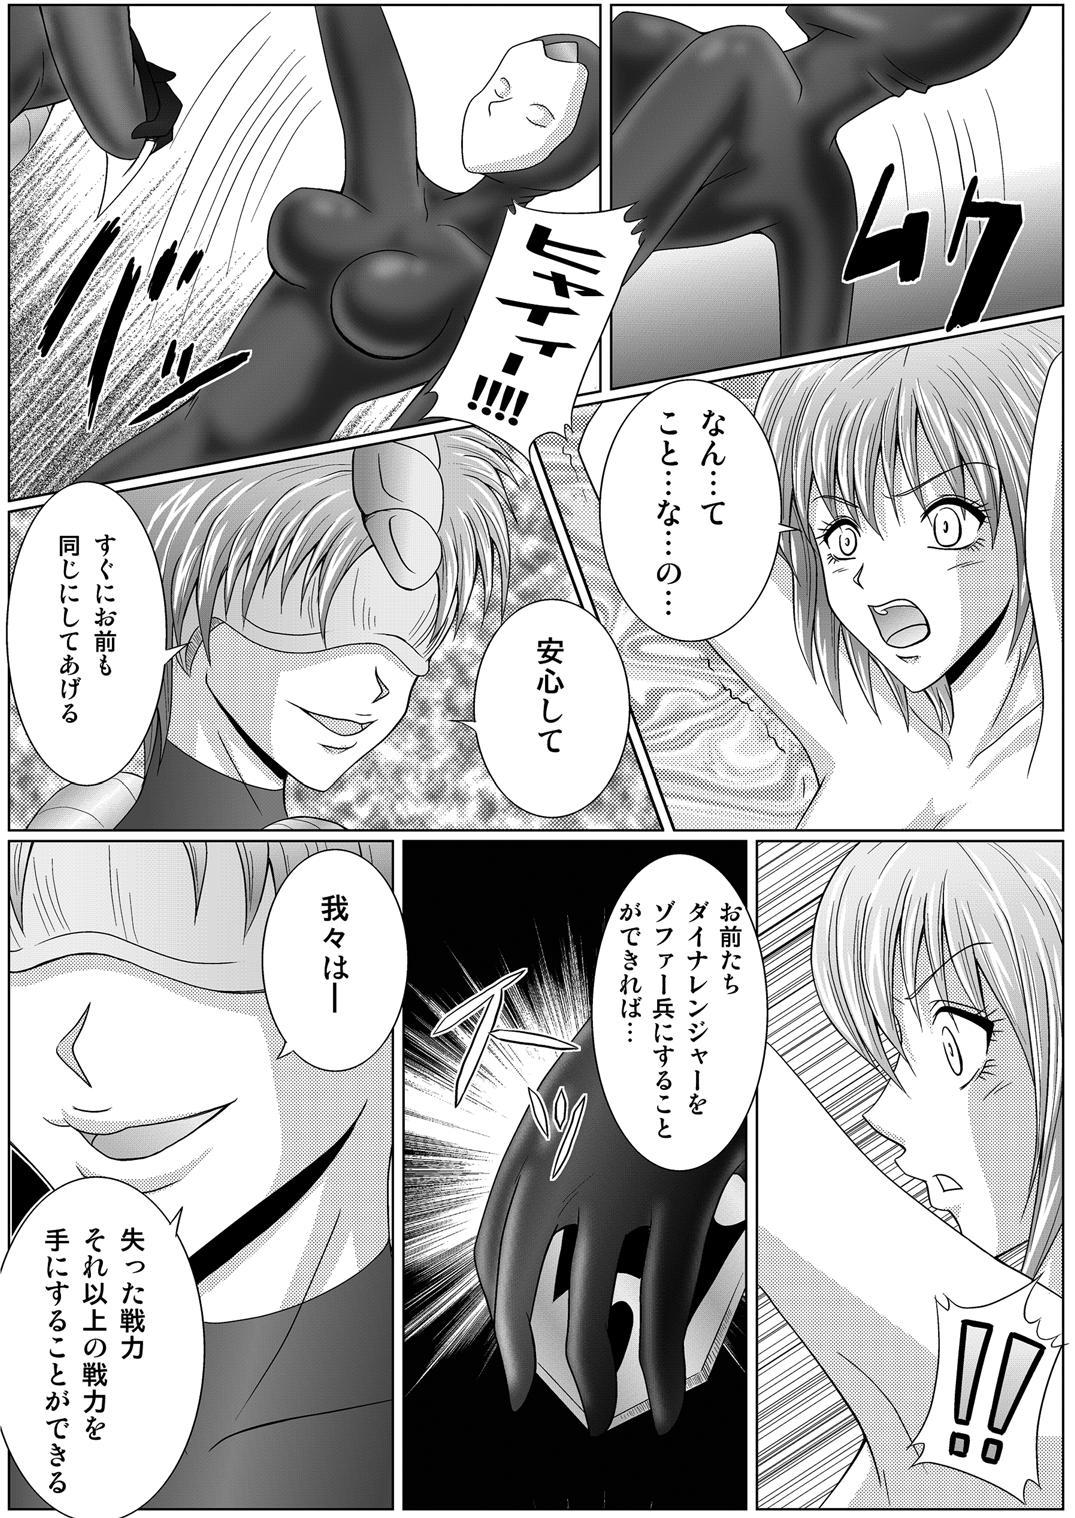 [Macxe's (monmon)] Tokubousentai Dinaranger ~Heroine Kairaku Sennou Keikaku~ Vol.01/02/03 (Renkaban) [Digital] 31